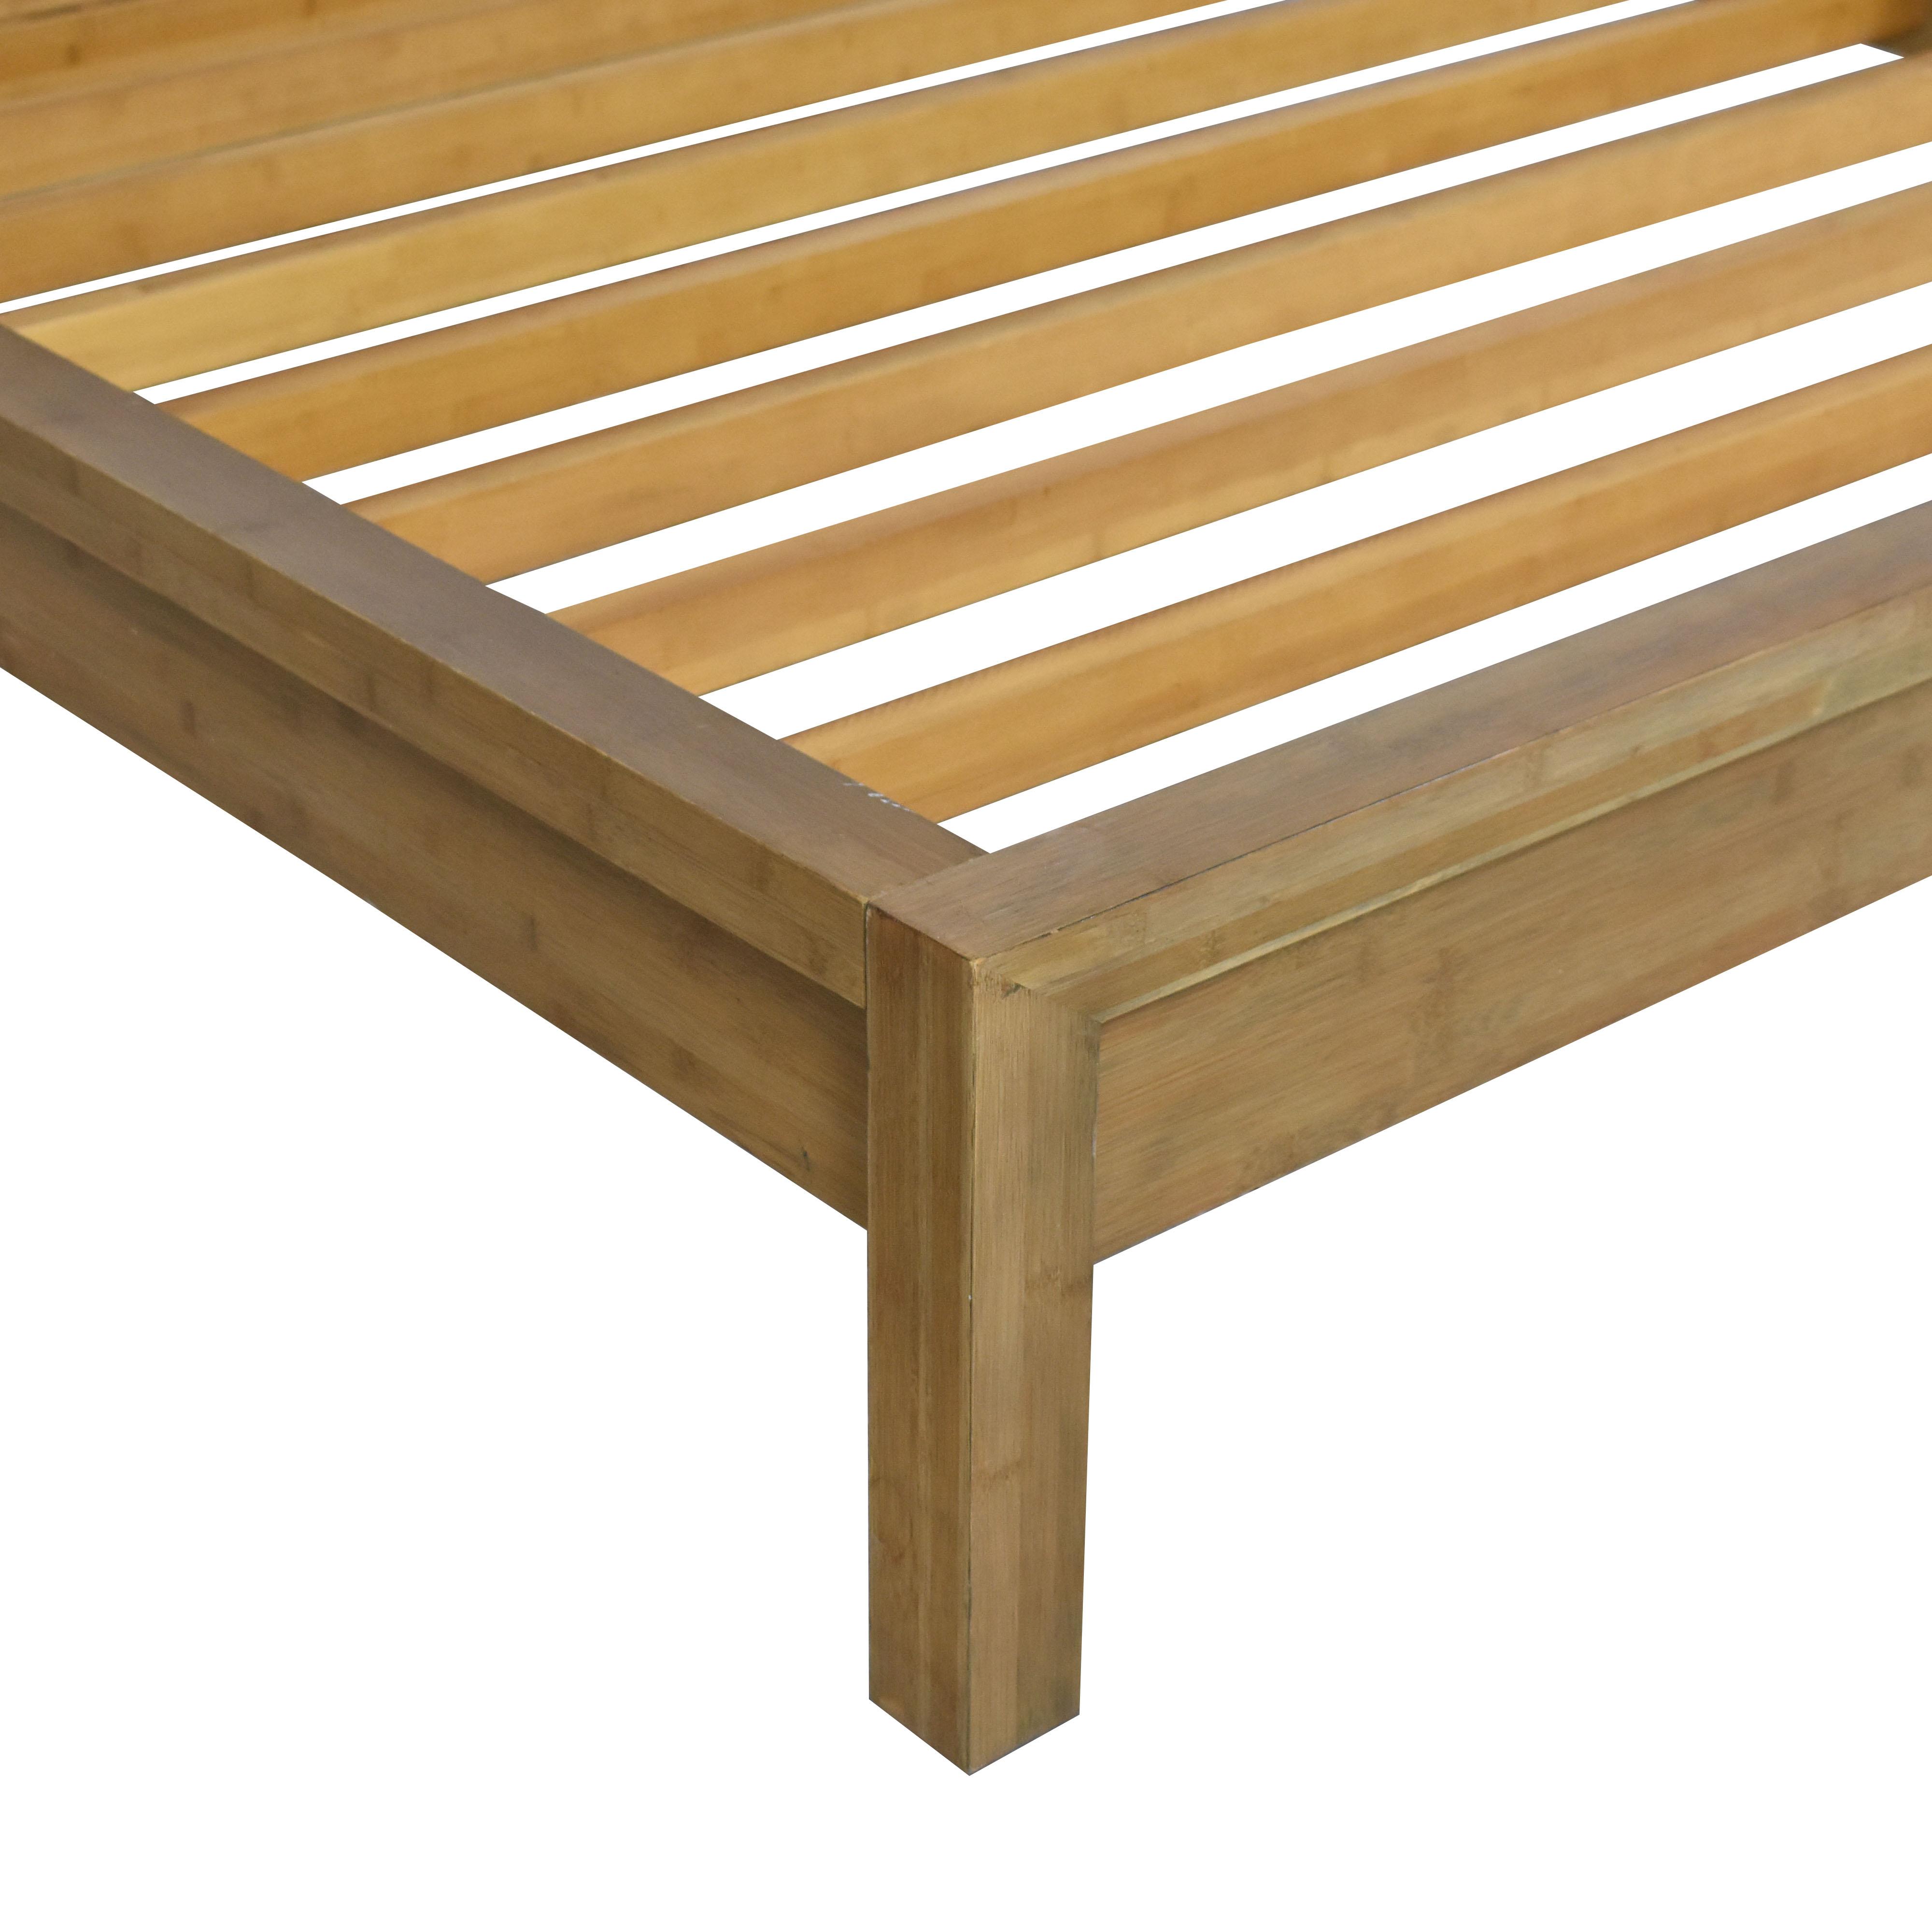 shop Room & Board Queen Bamboo Timbre Maria Yee Platform Bed Room & Board